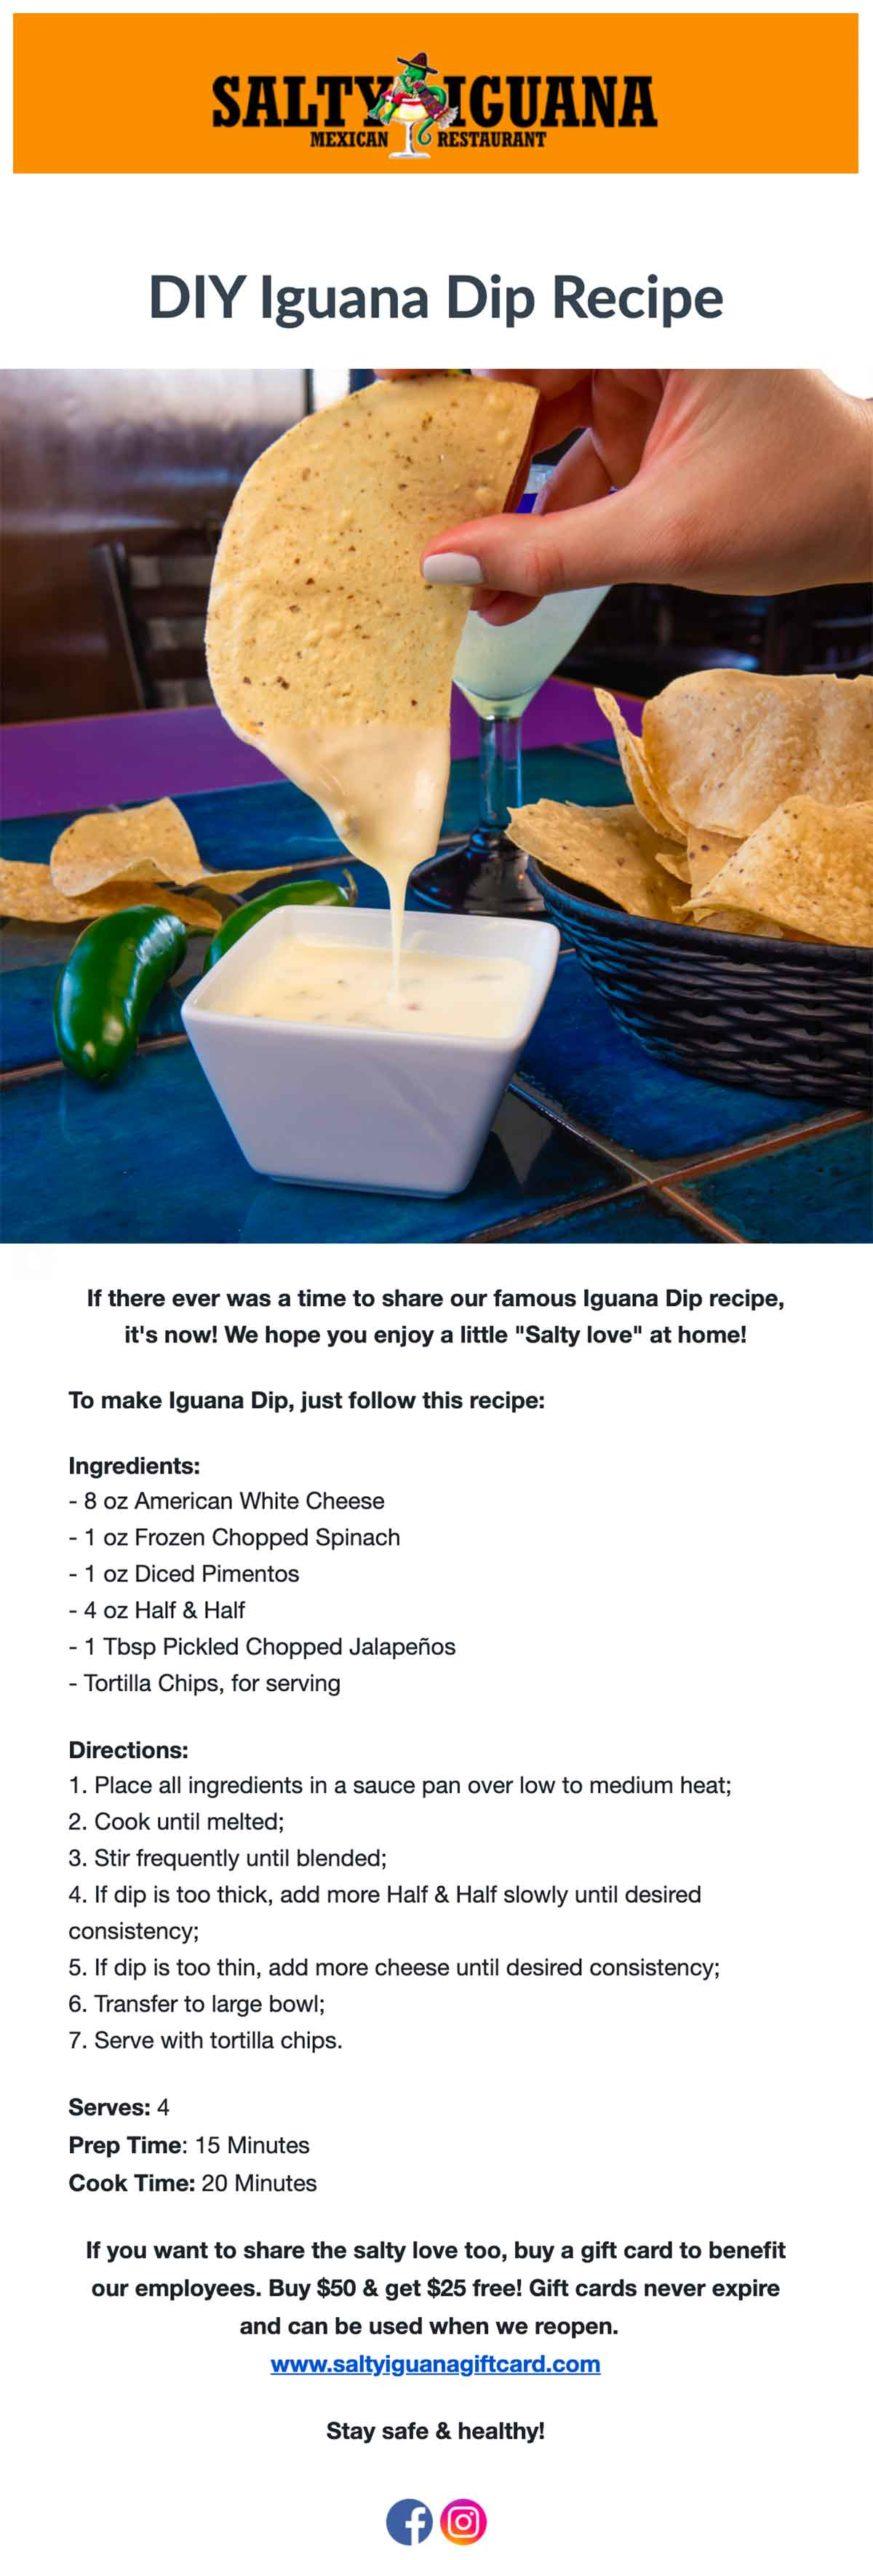 Salty Iguana: DIY Iguana Dip Recipe email